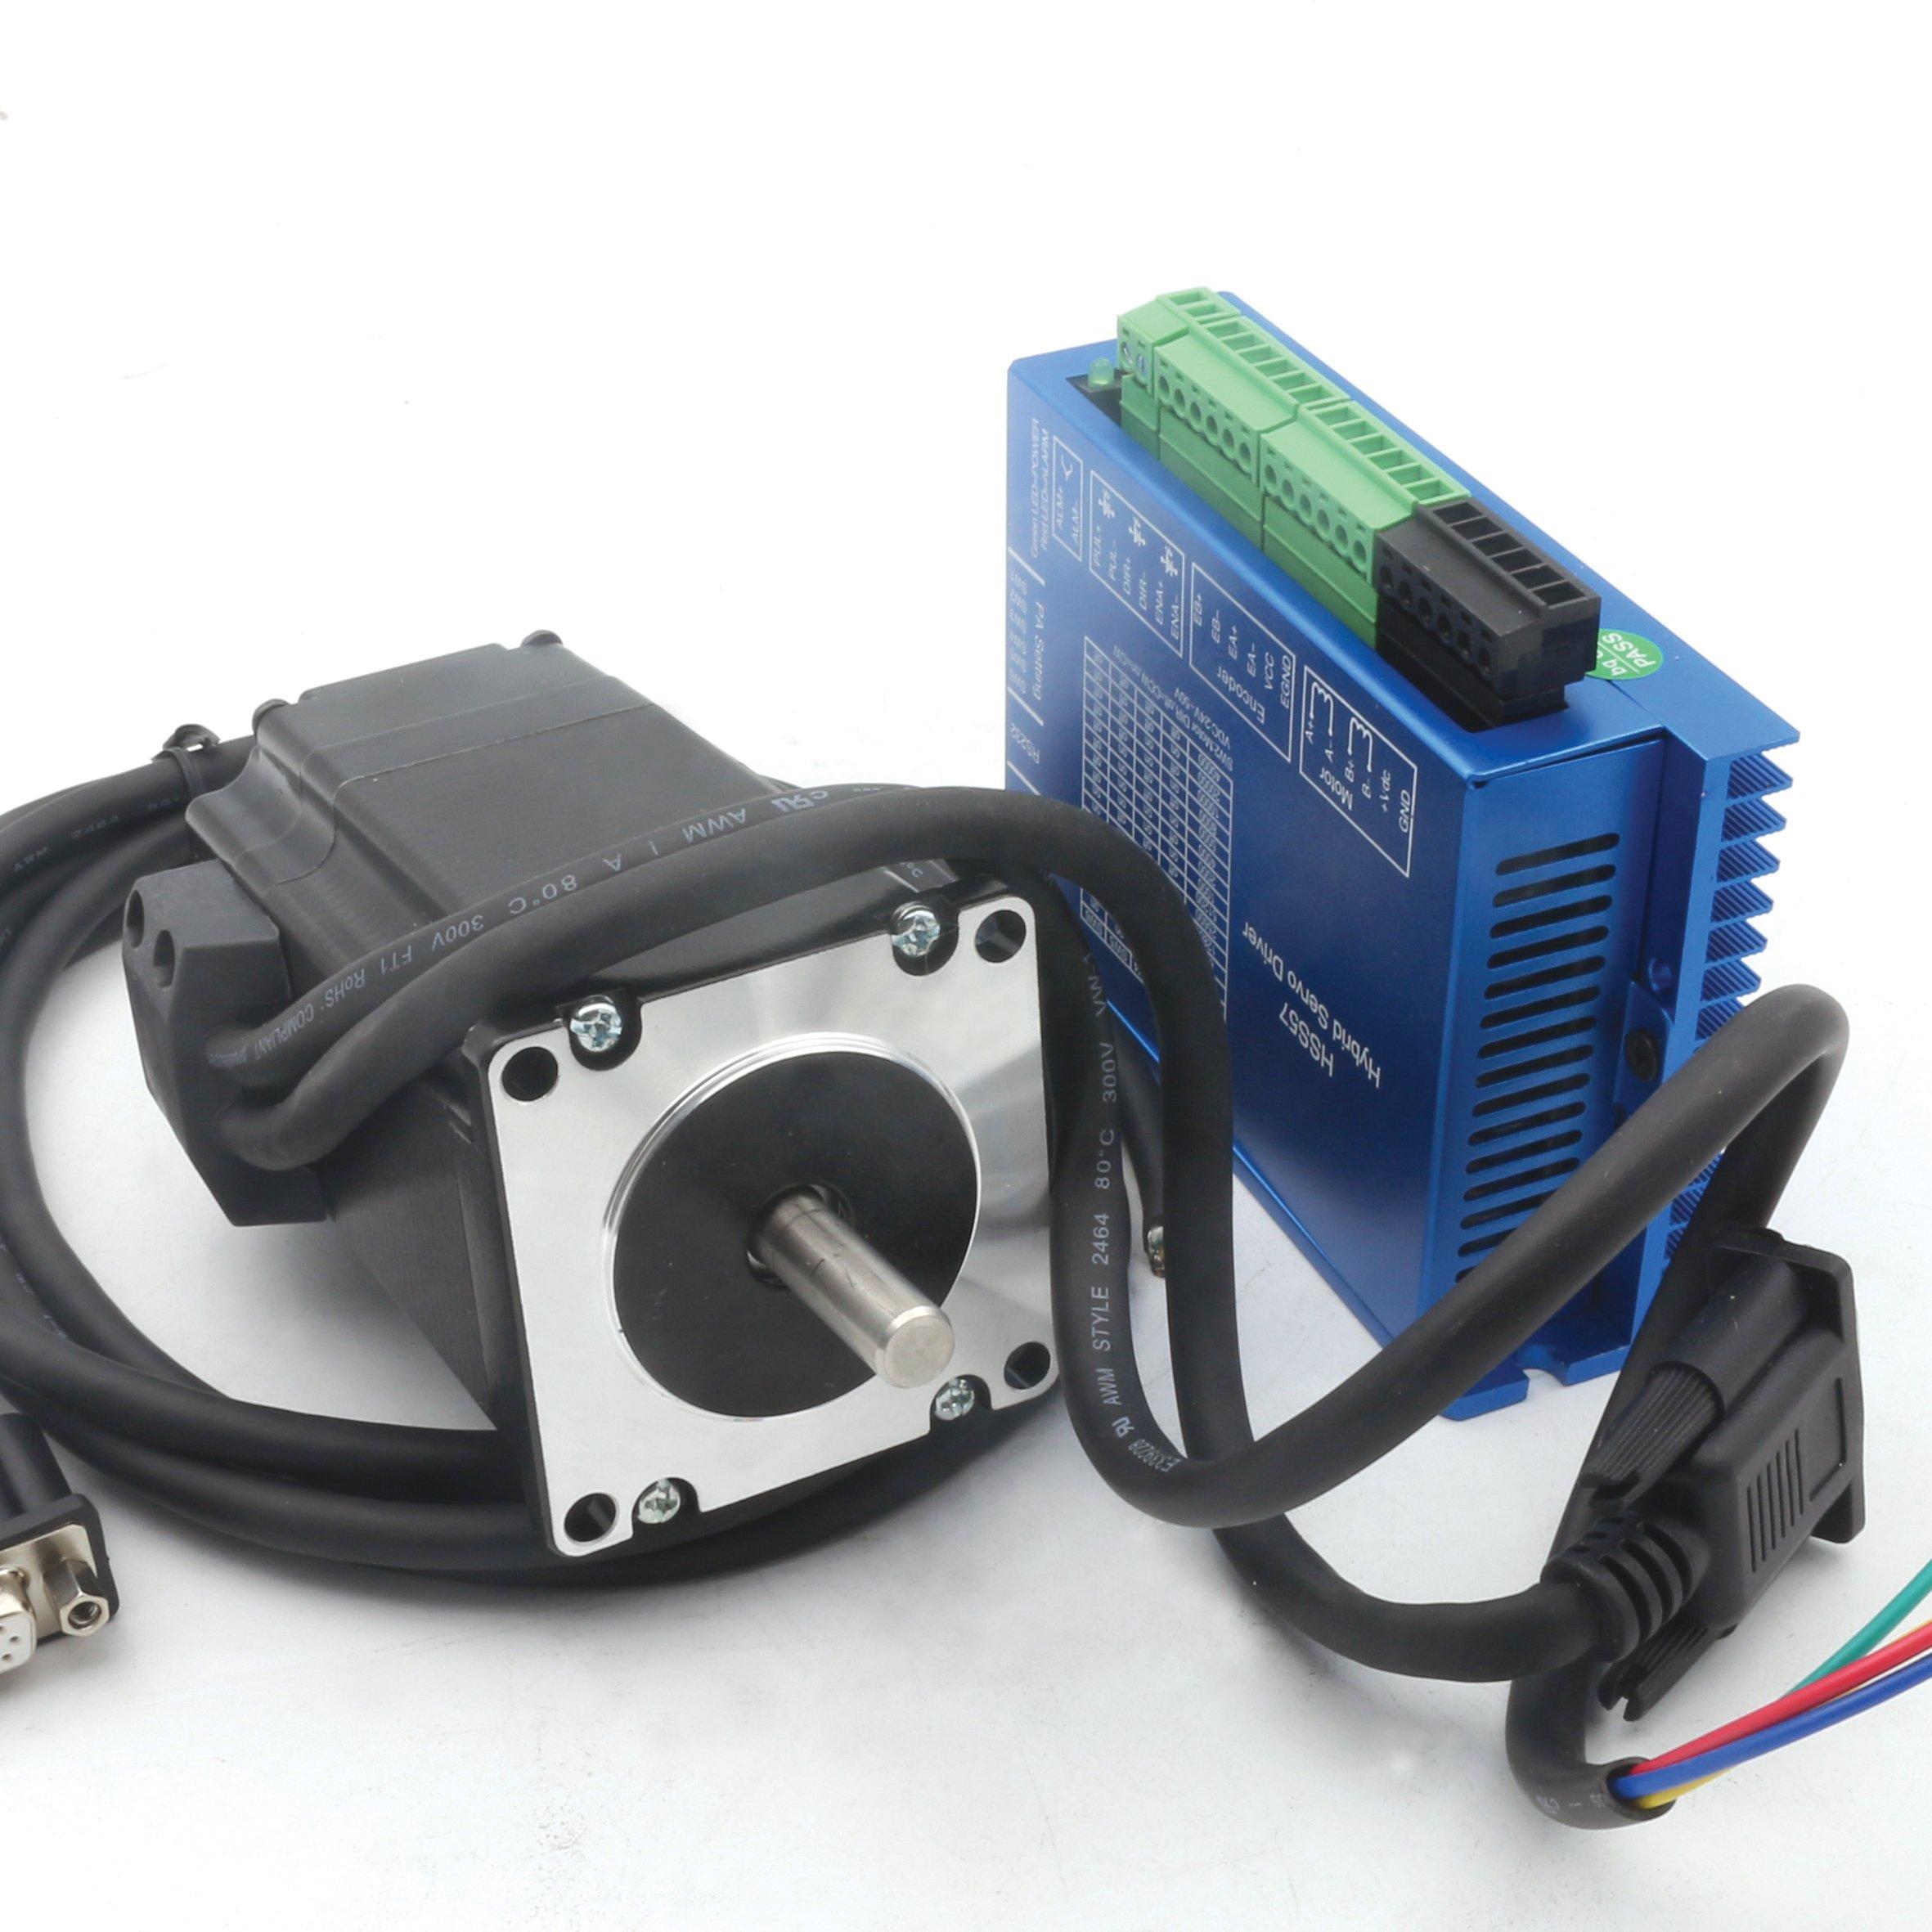 Nema23 2N.m 57 Hybrid Closed Loop Servo Motor 76mm+HSS57 Servo Driver Controller CNC Kit 24-50VDC For CNC Router Engraving Milling Machine